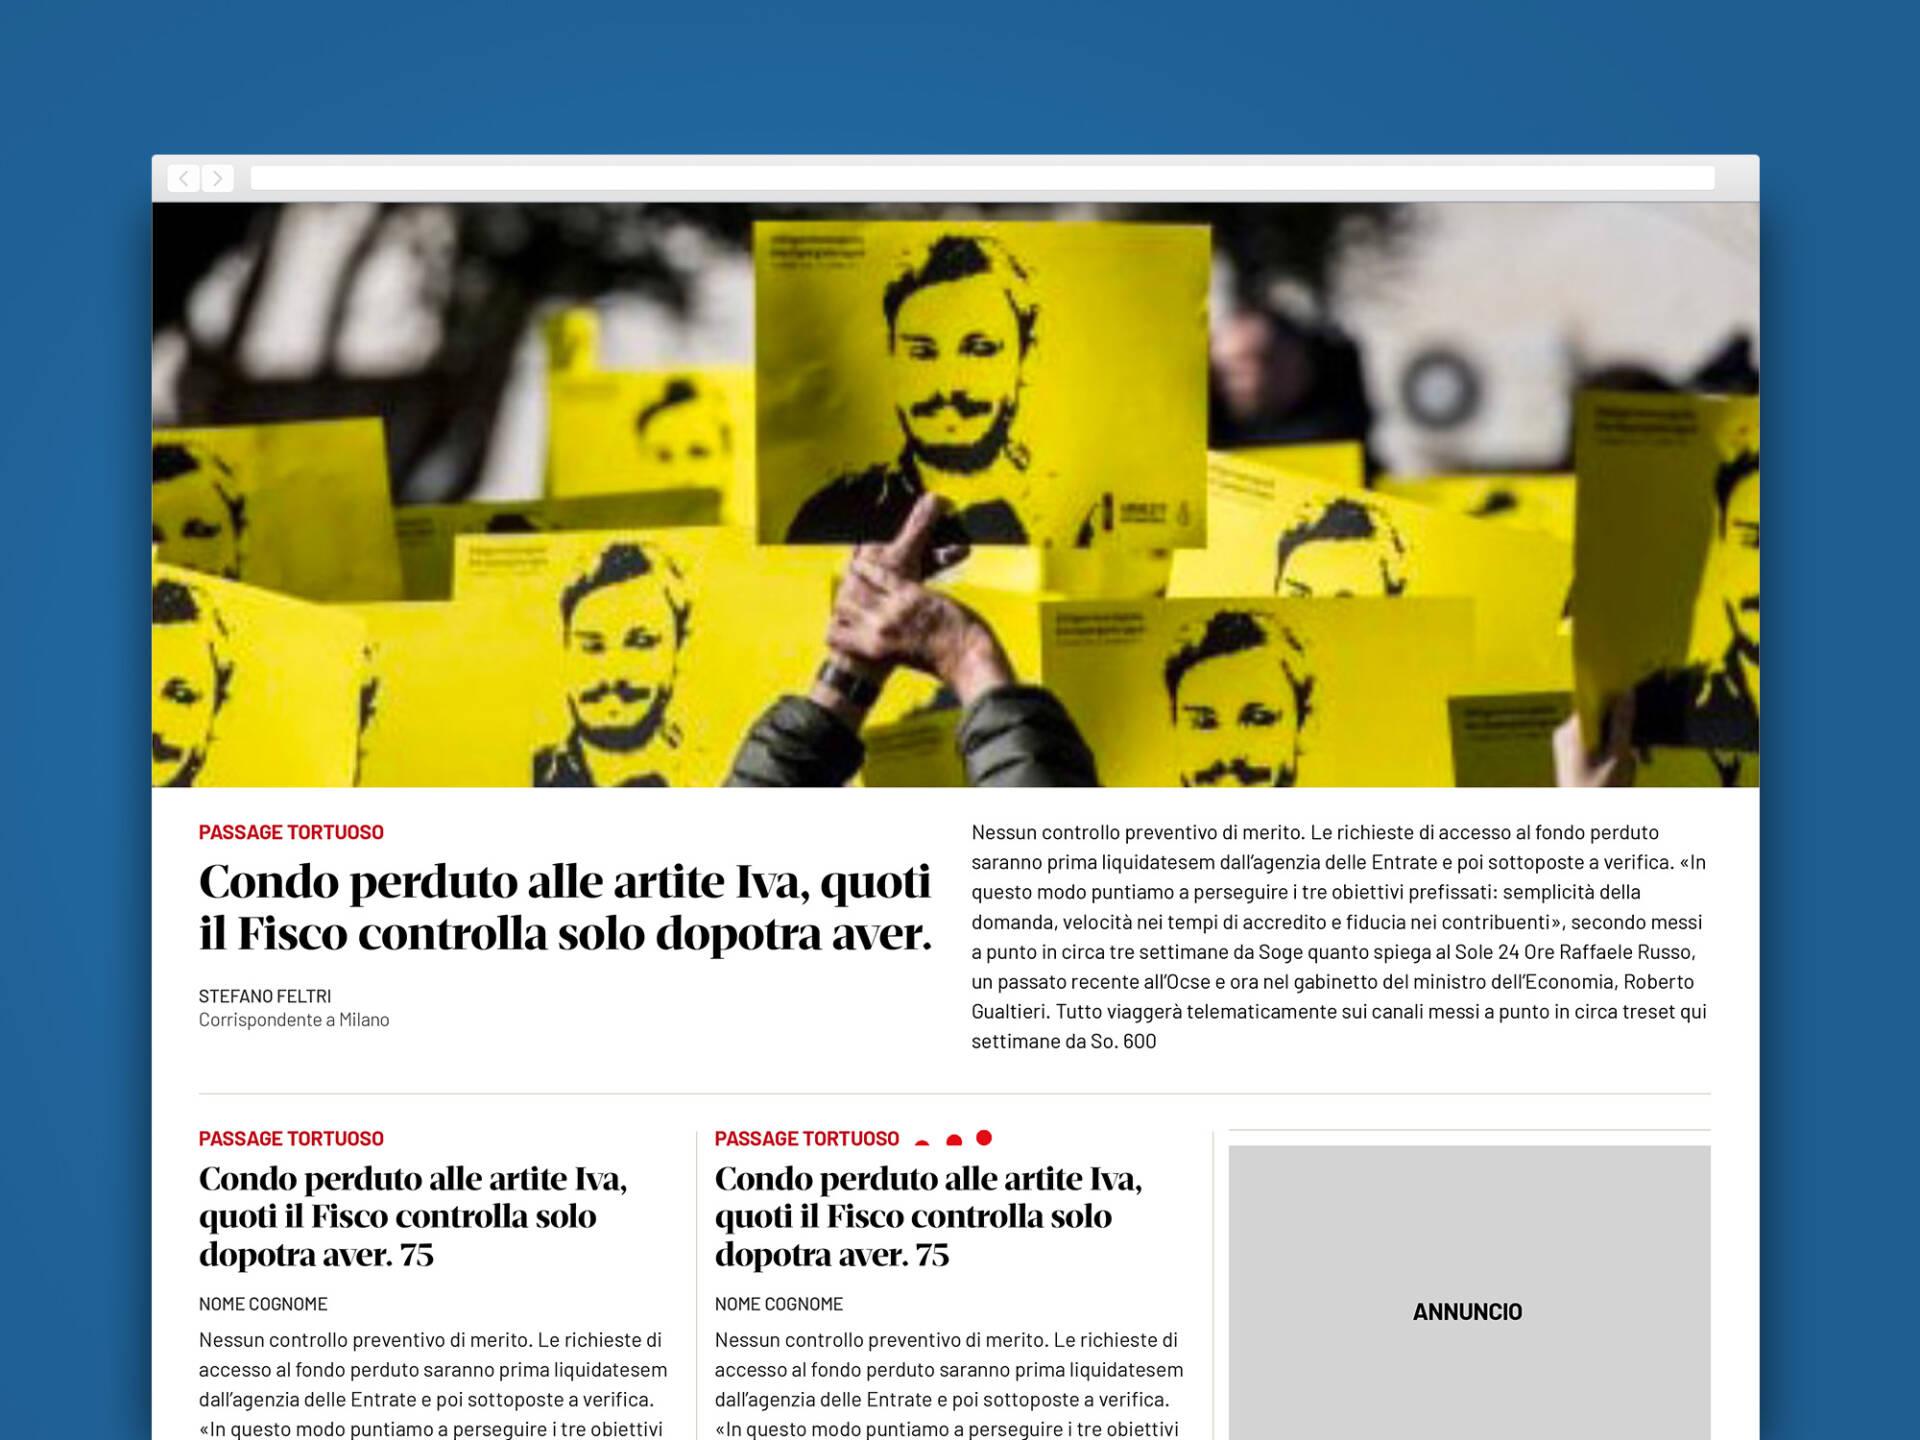 Domani_Web_Wenceslau_News_Design_3b